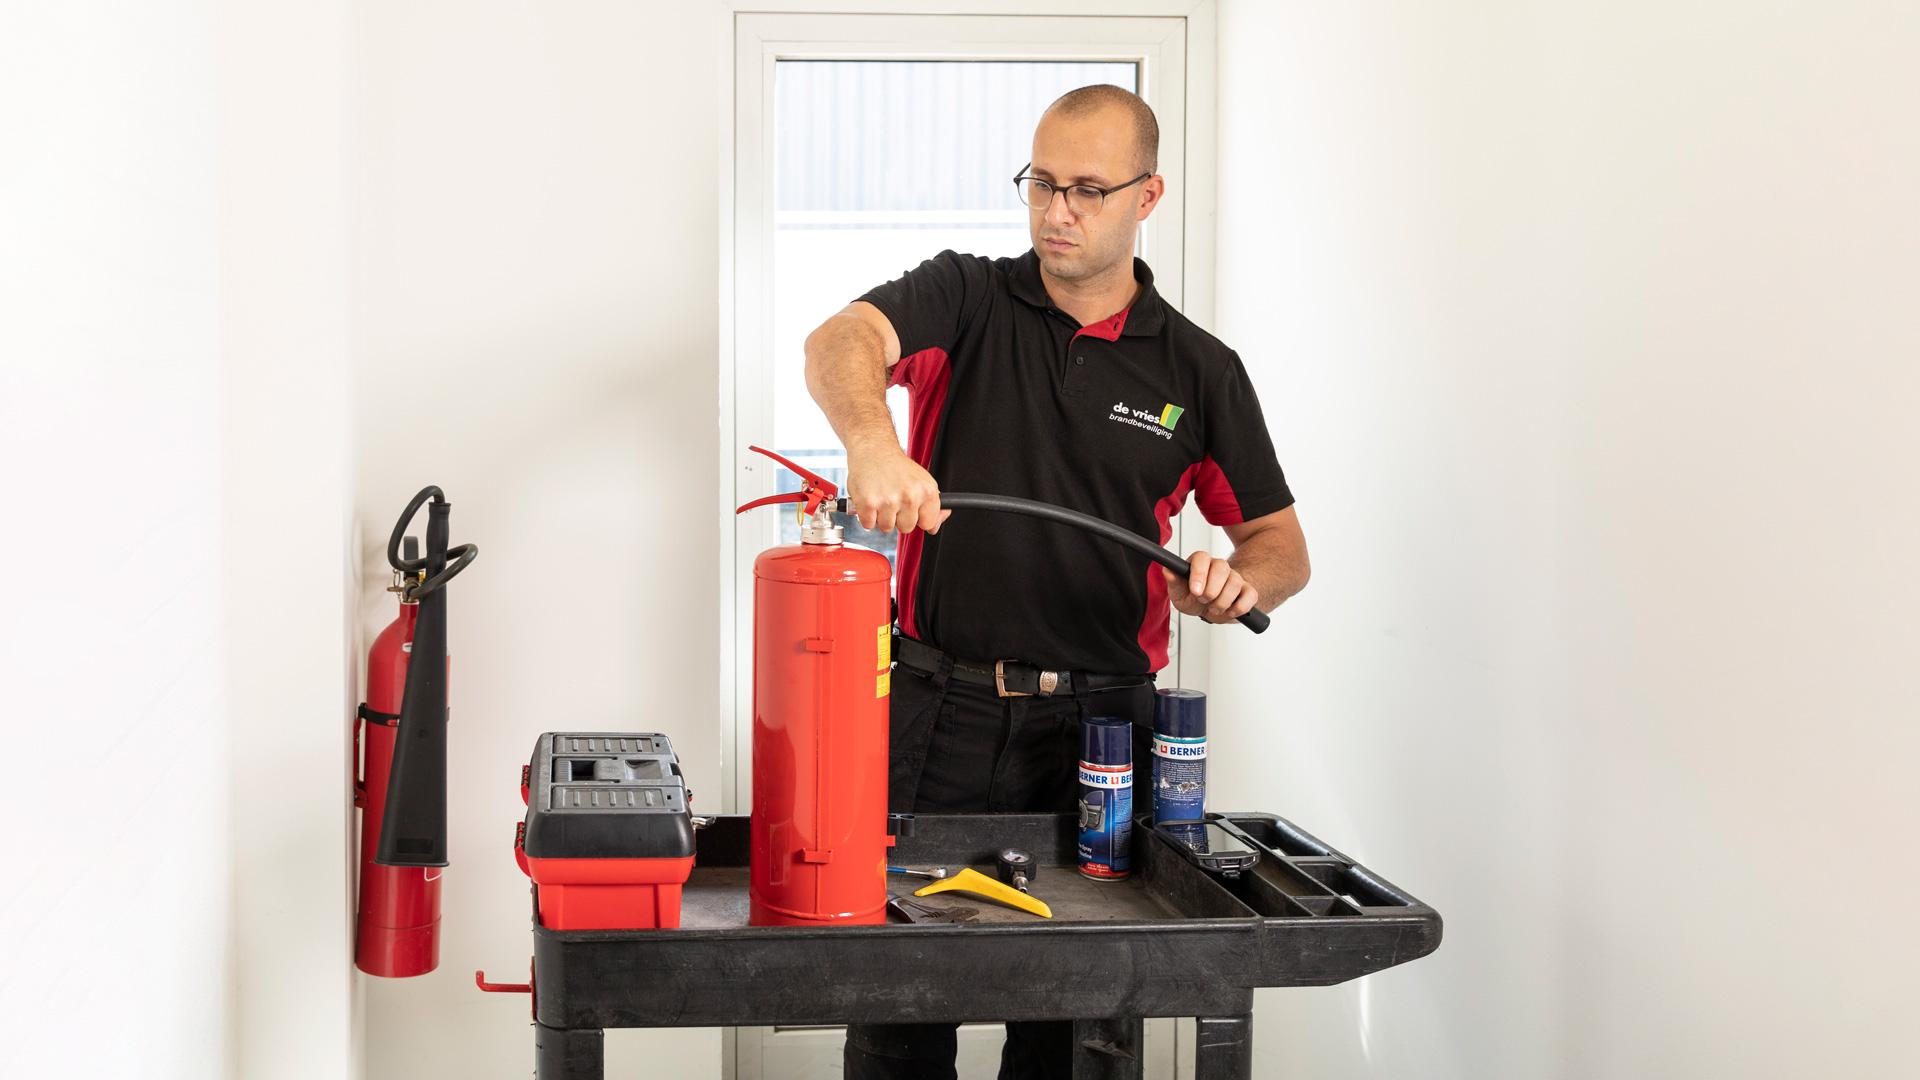 Brandblusser onderhoud 1